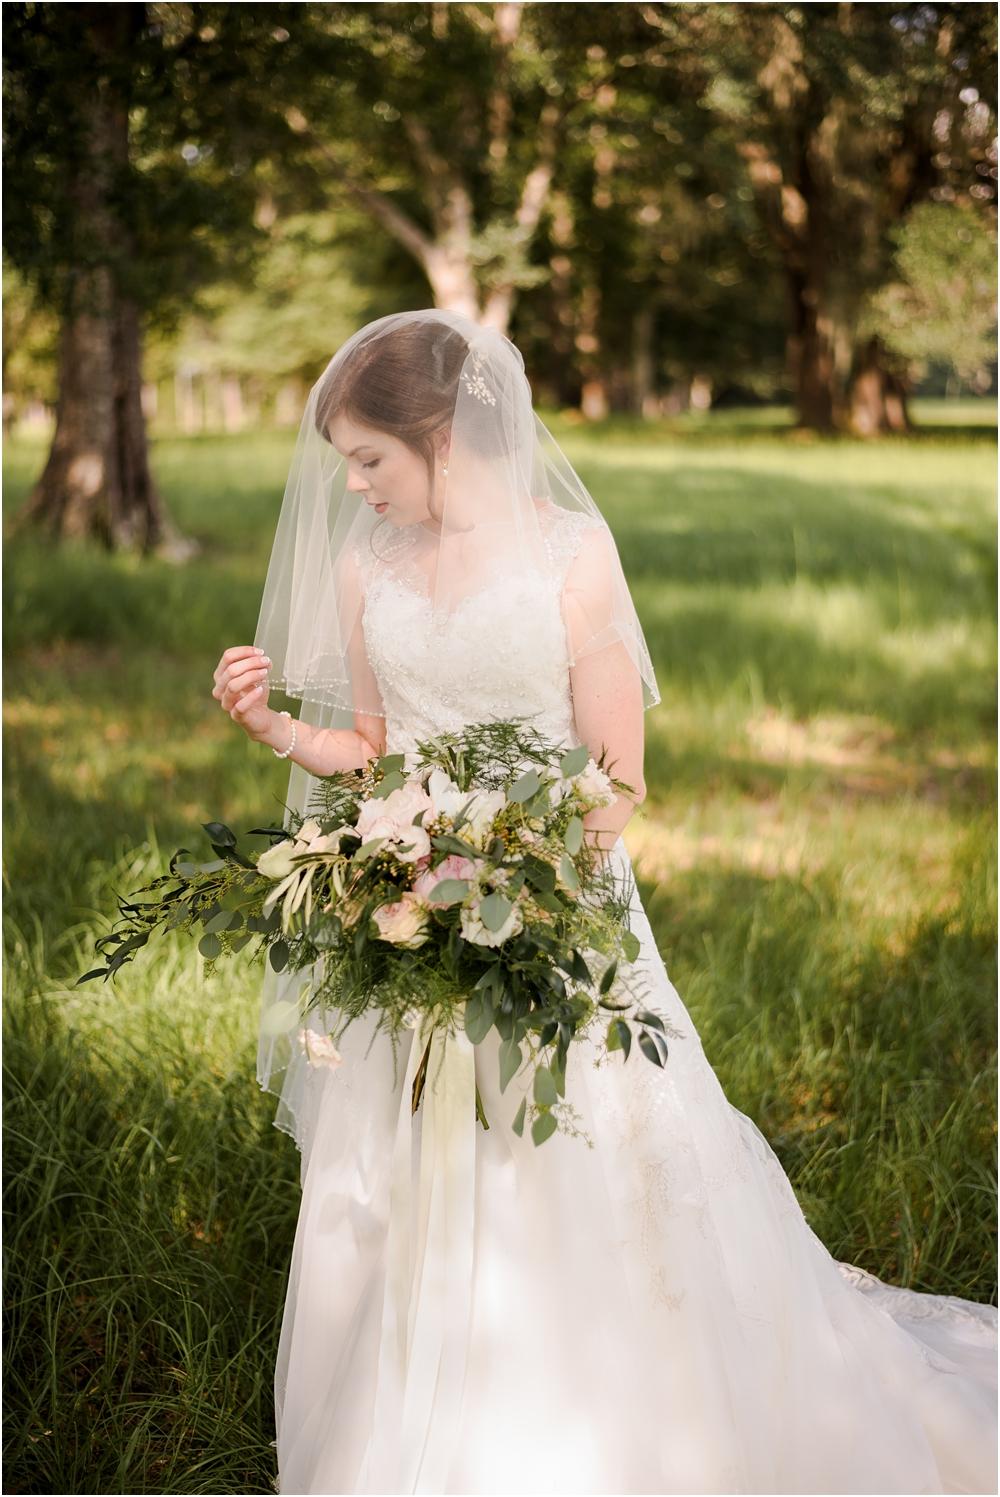 marianna-florida-wedding-photographer-kiersten-grant-38.jpg